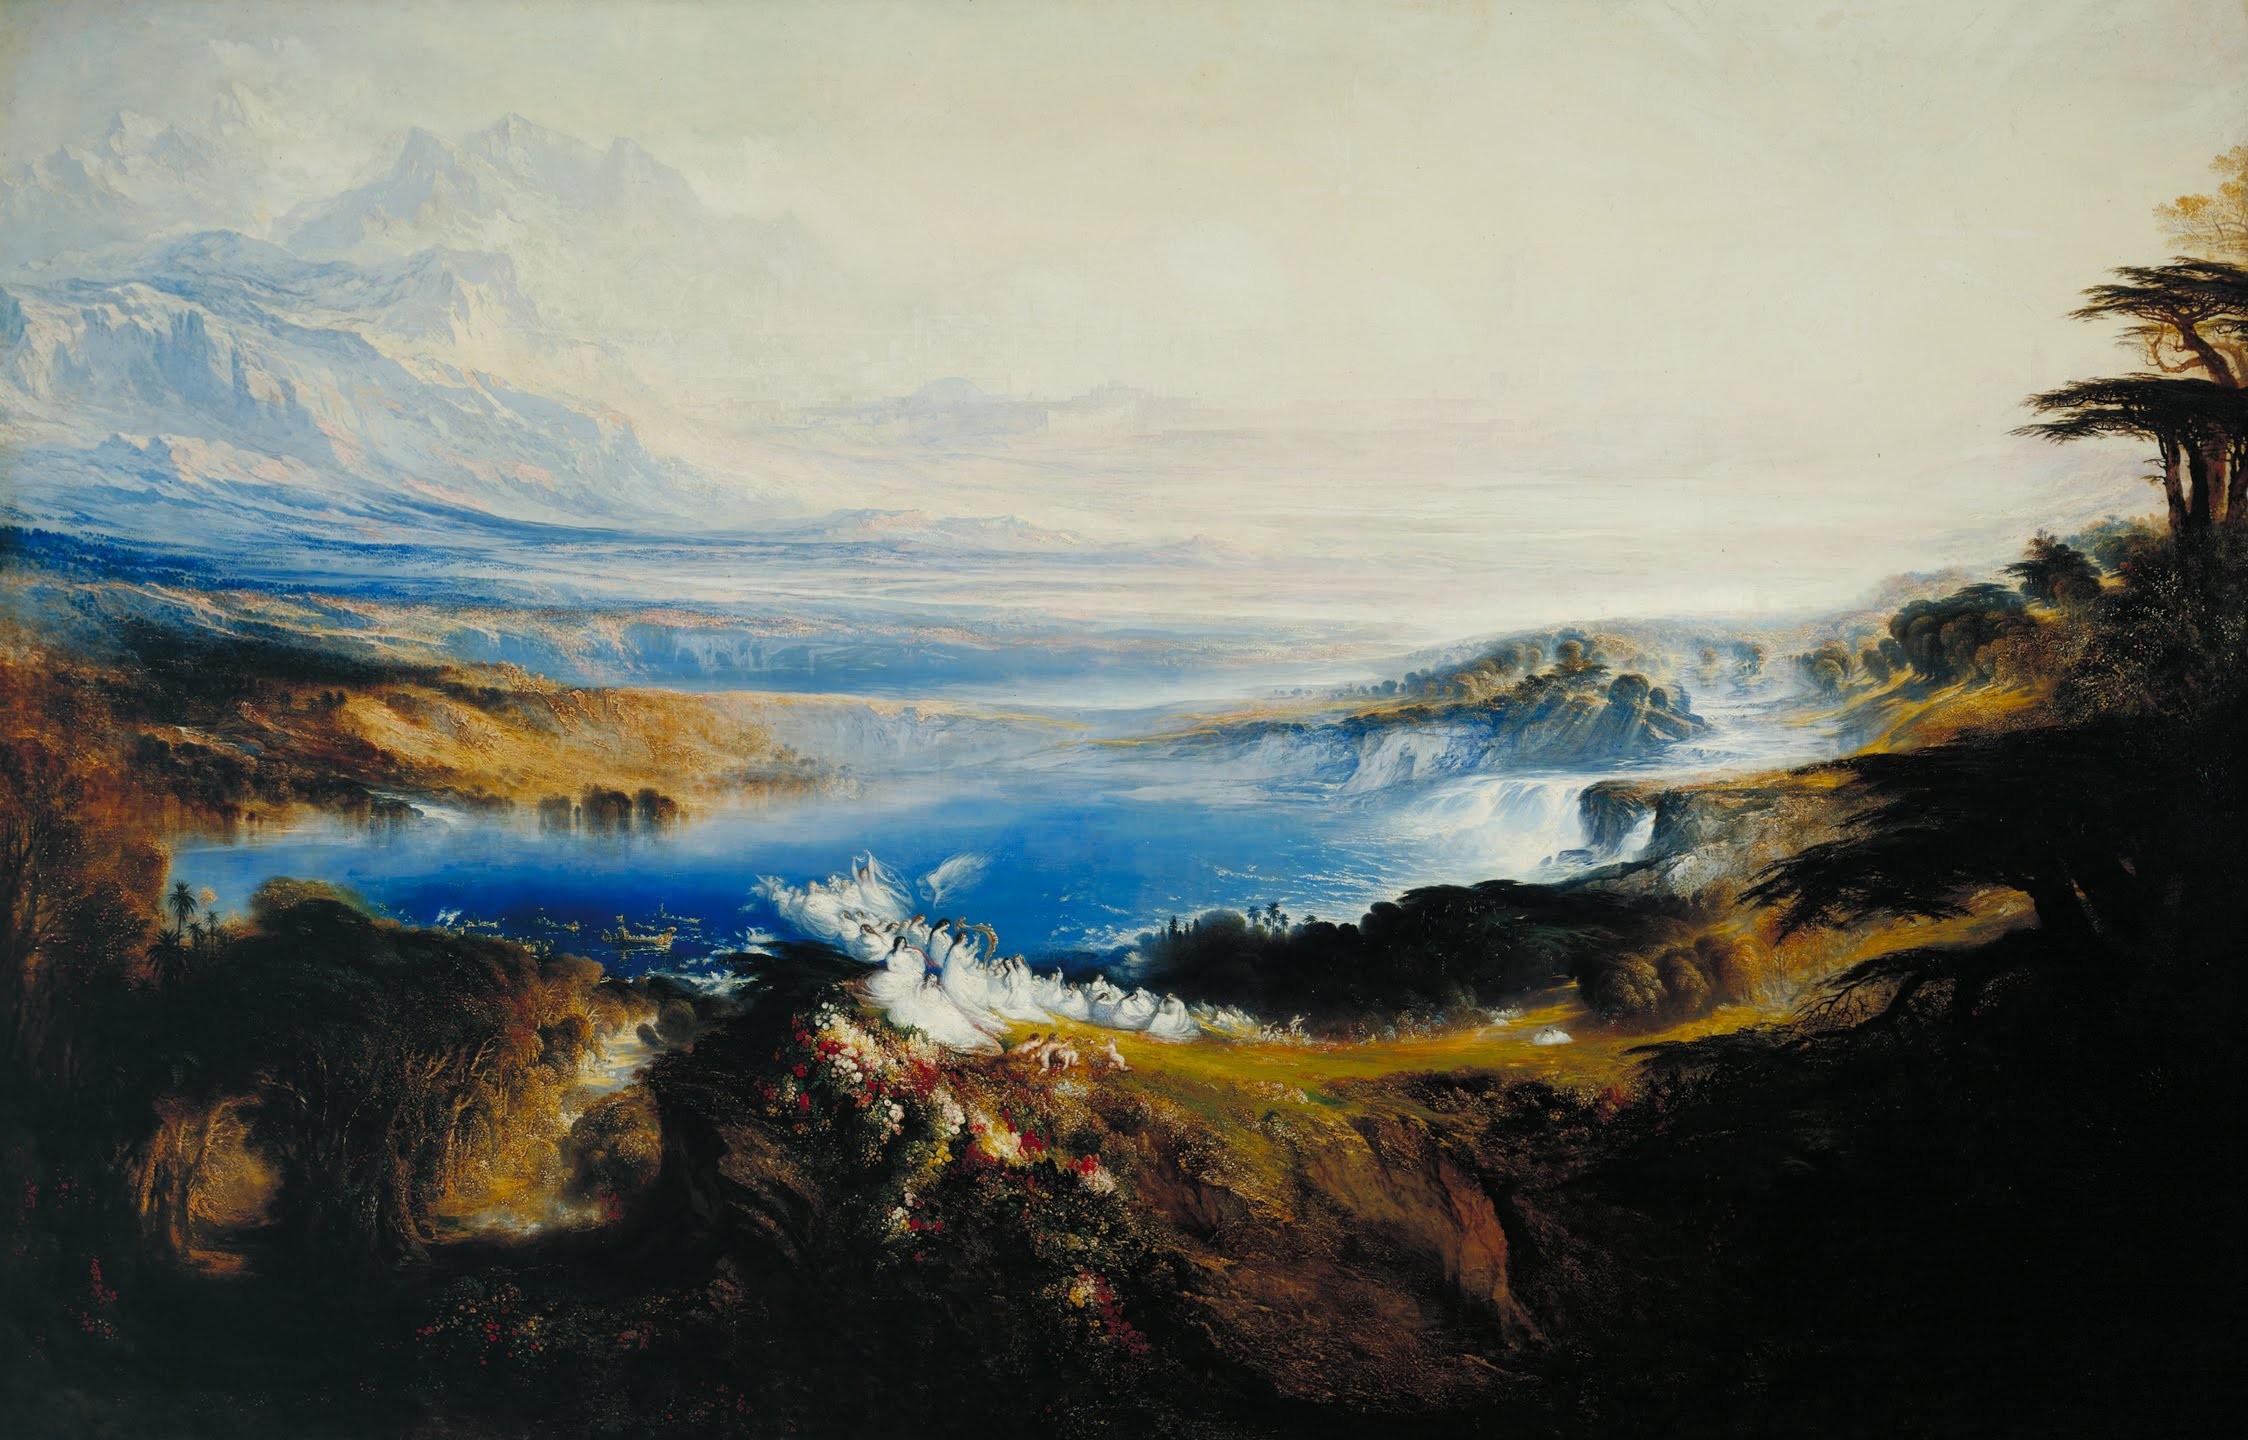 John_Martin_-_The_Plains_of_Heaven_-_Google_Art_Project